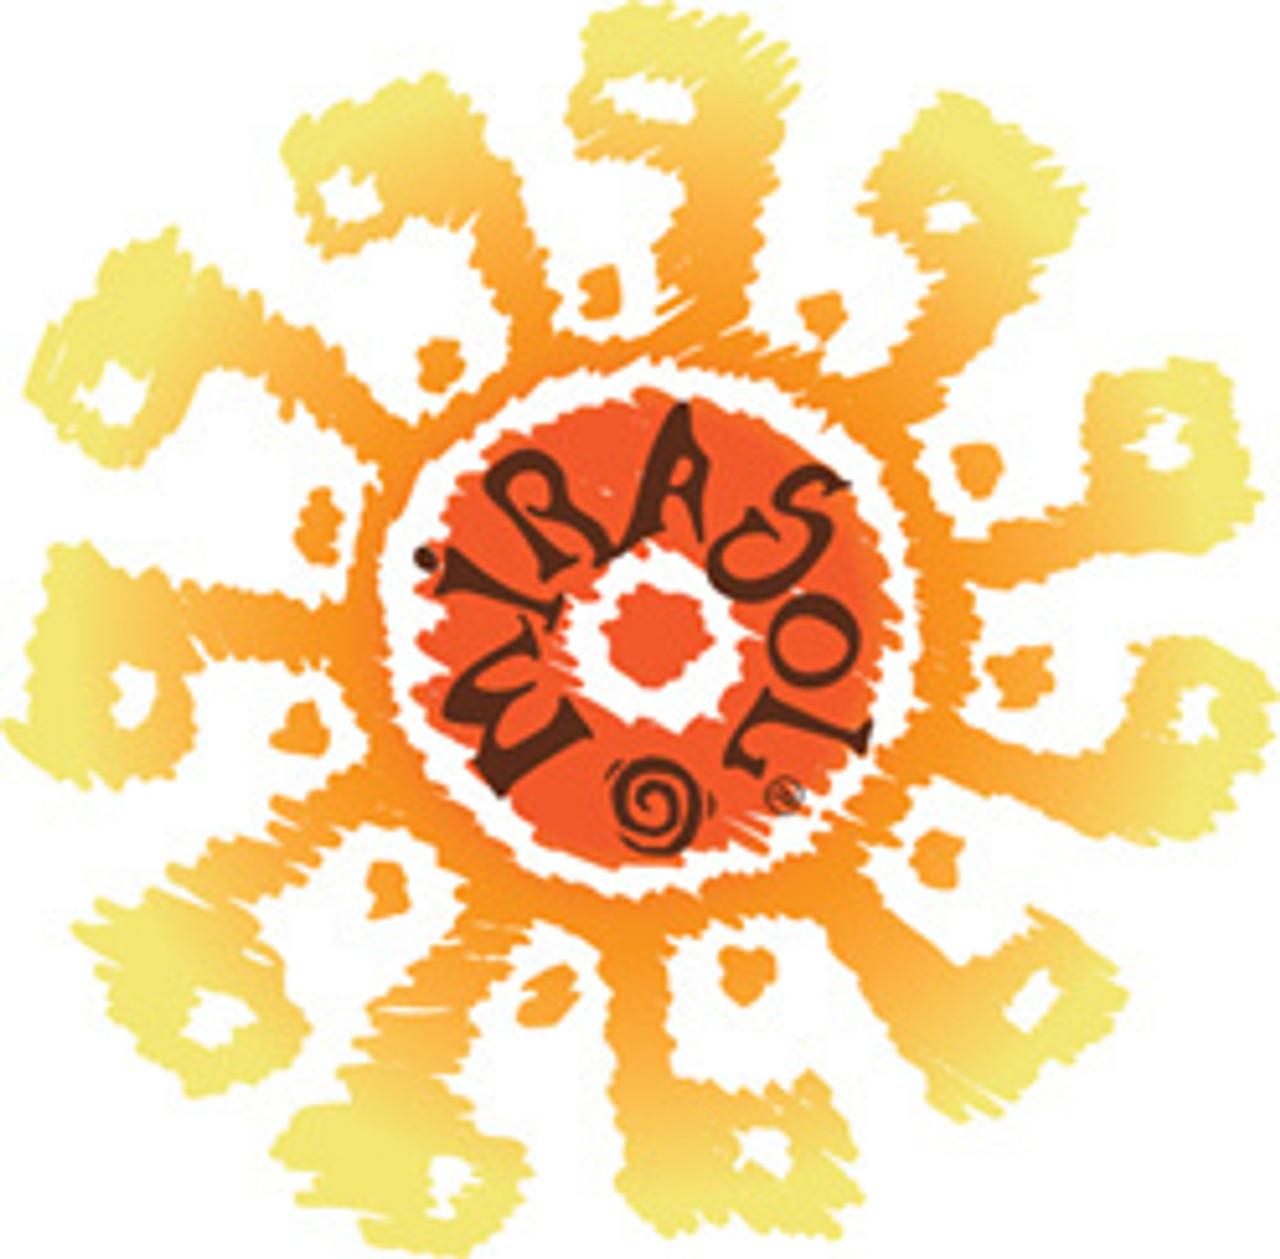 Mirasol Yarns - the Mirasol Project supports local communities in Peru